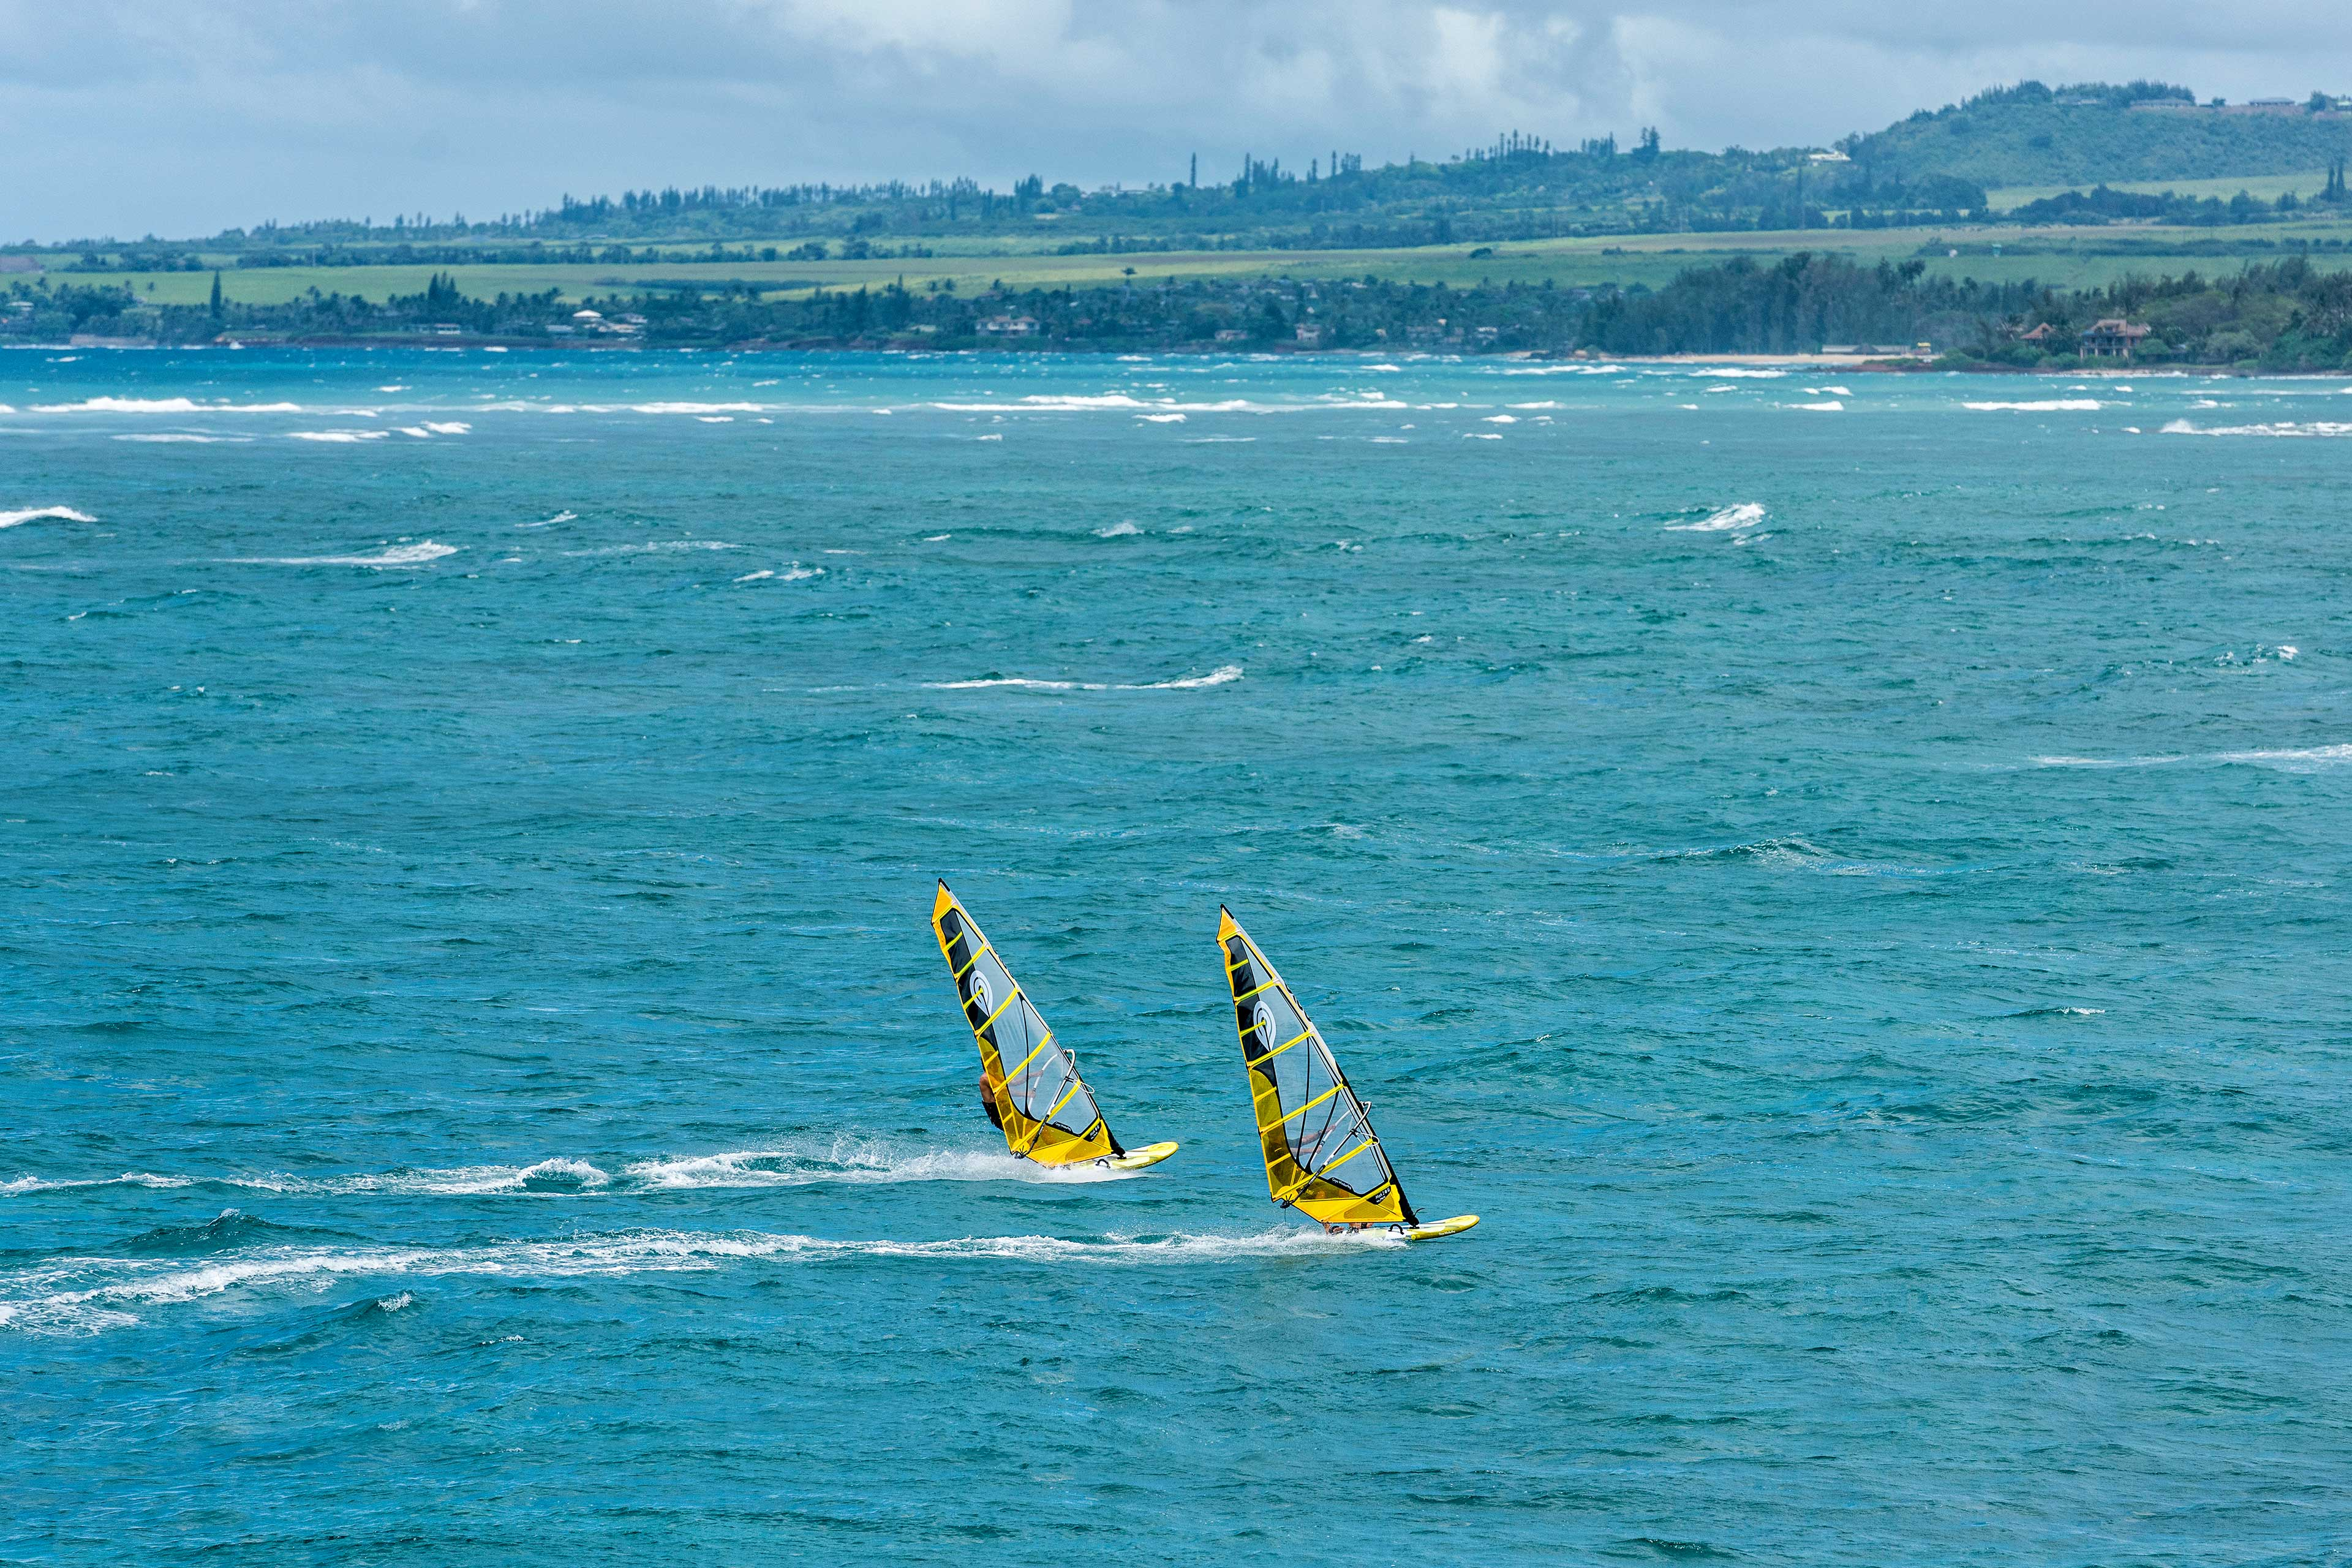 Goya Windsurfing - Sails - Mark 2 Pro